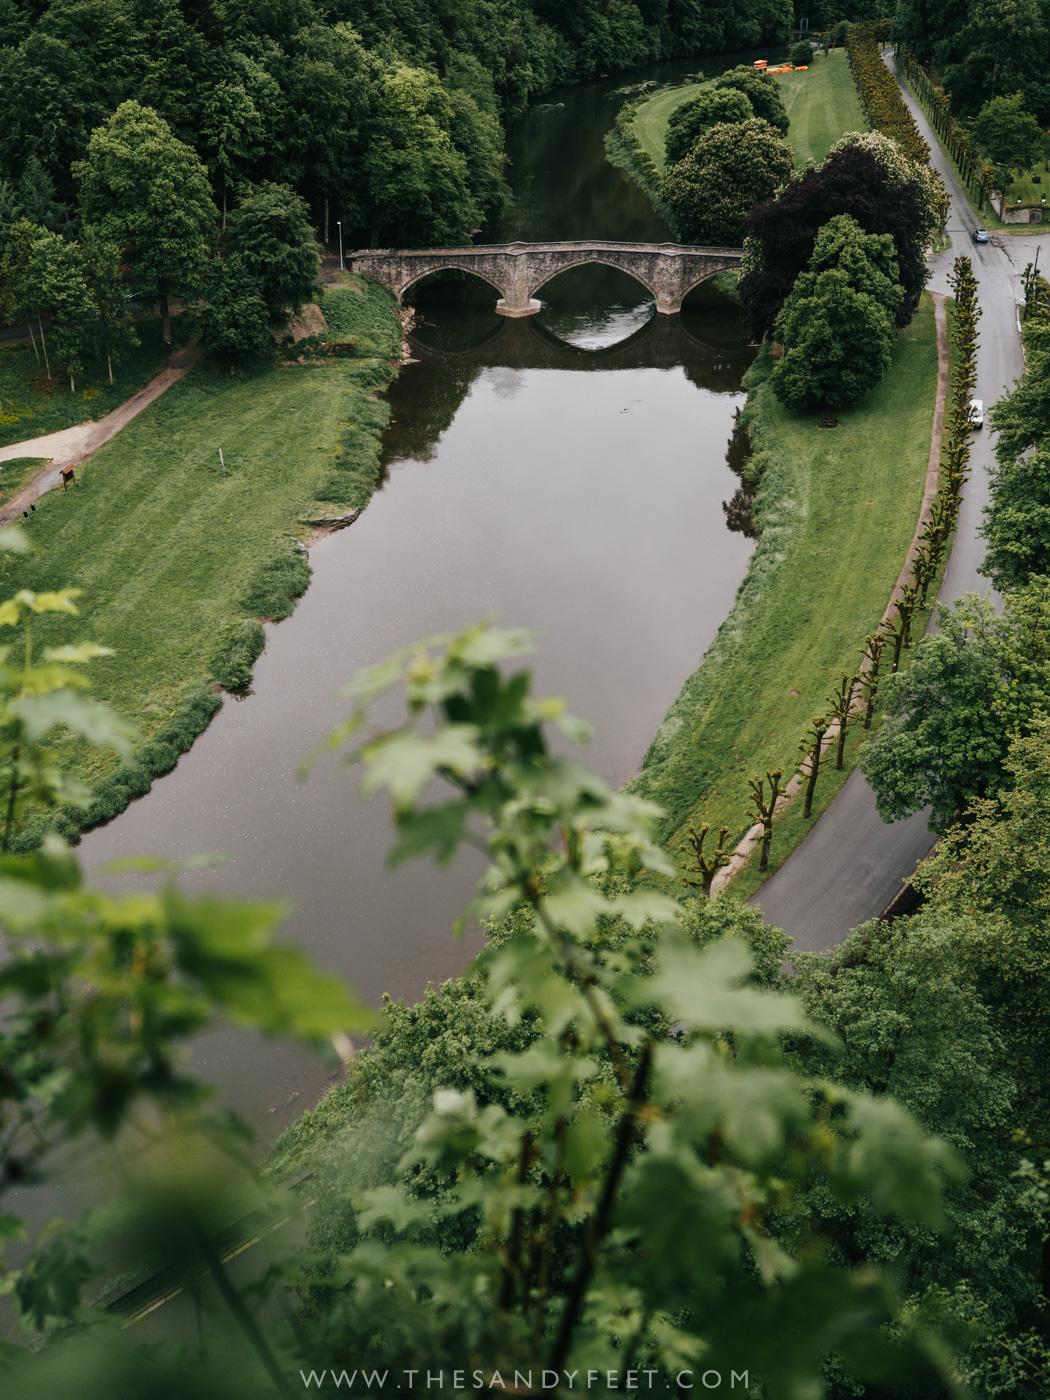 Hiking around Bouillon   Top Things To Do In Belgium's Wallonia Region